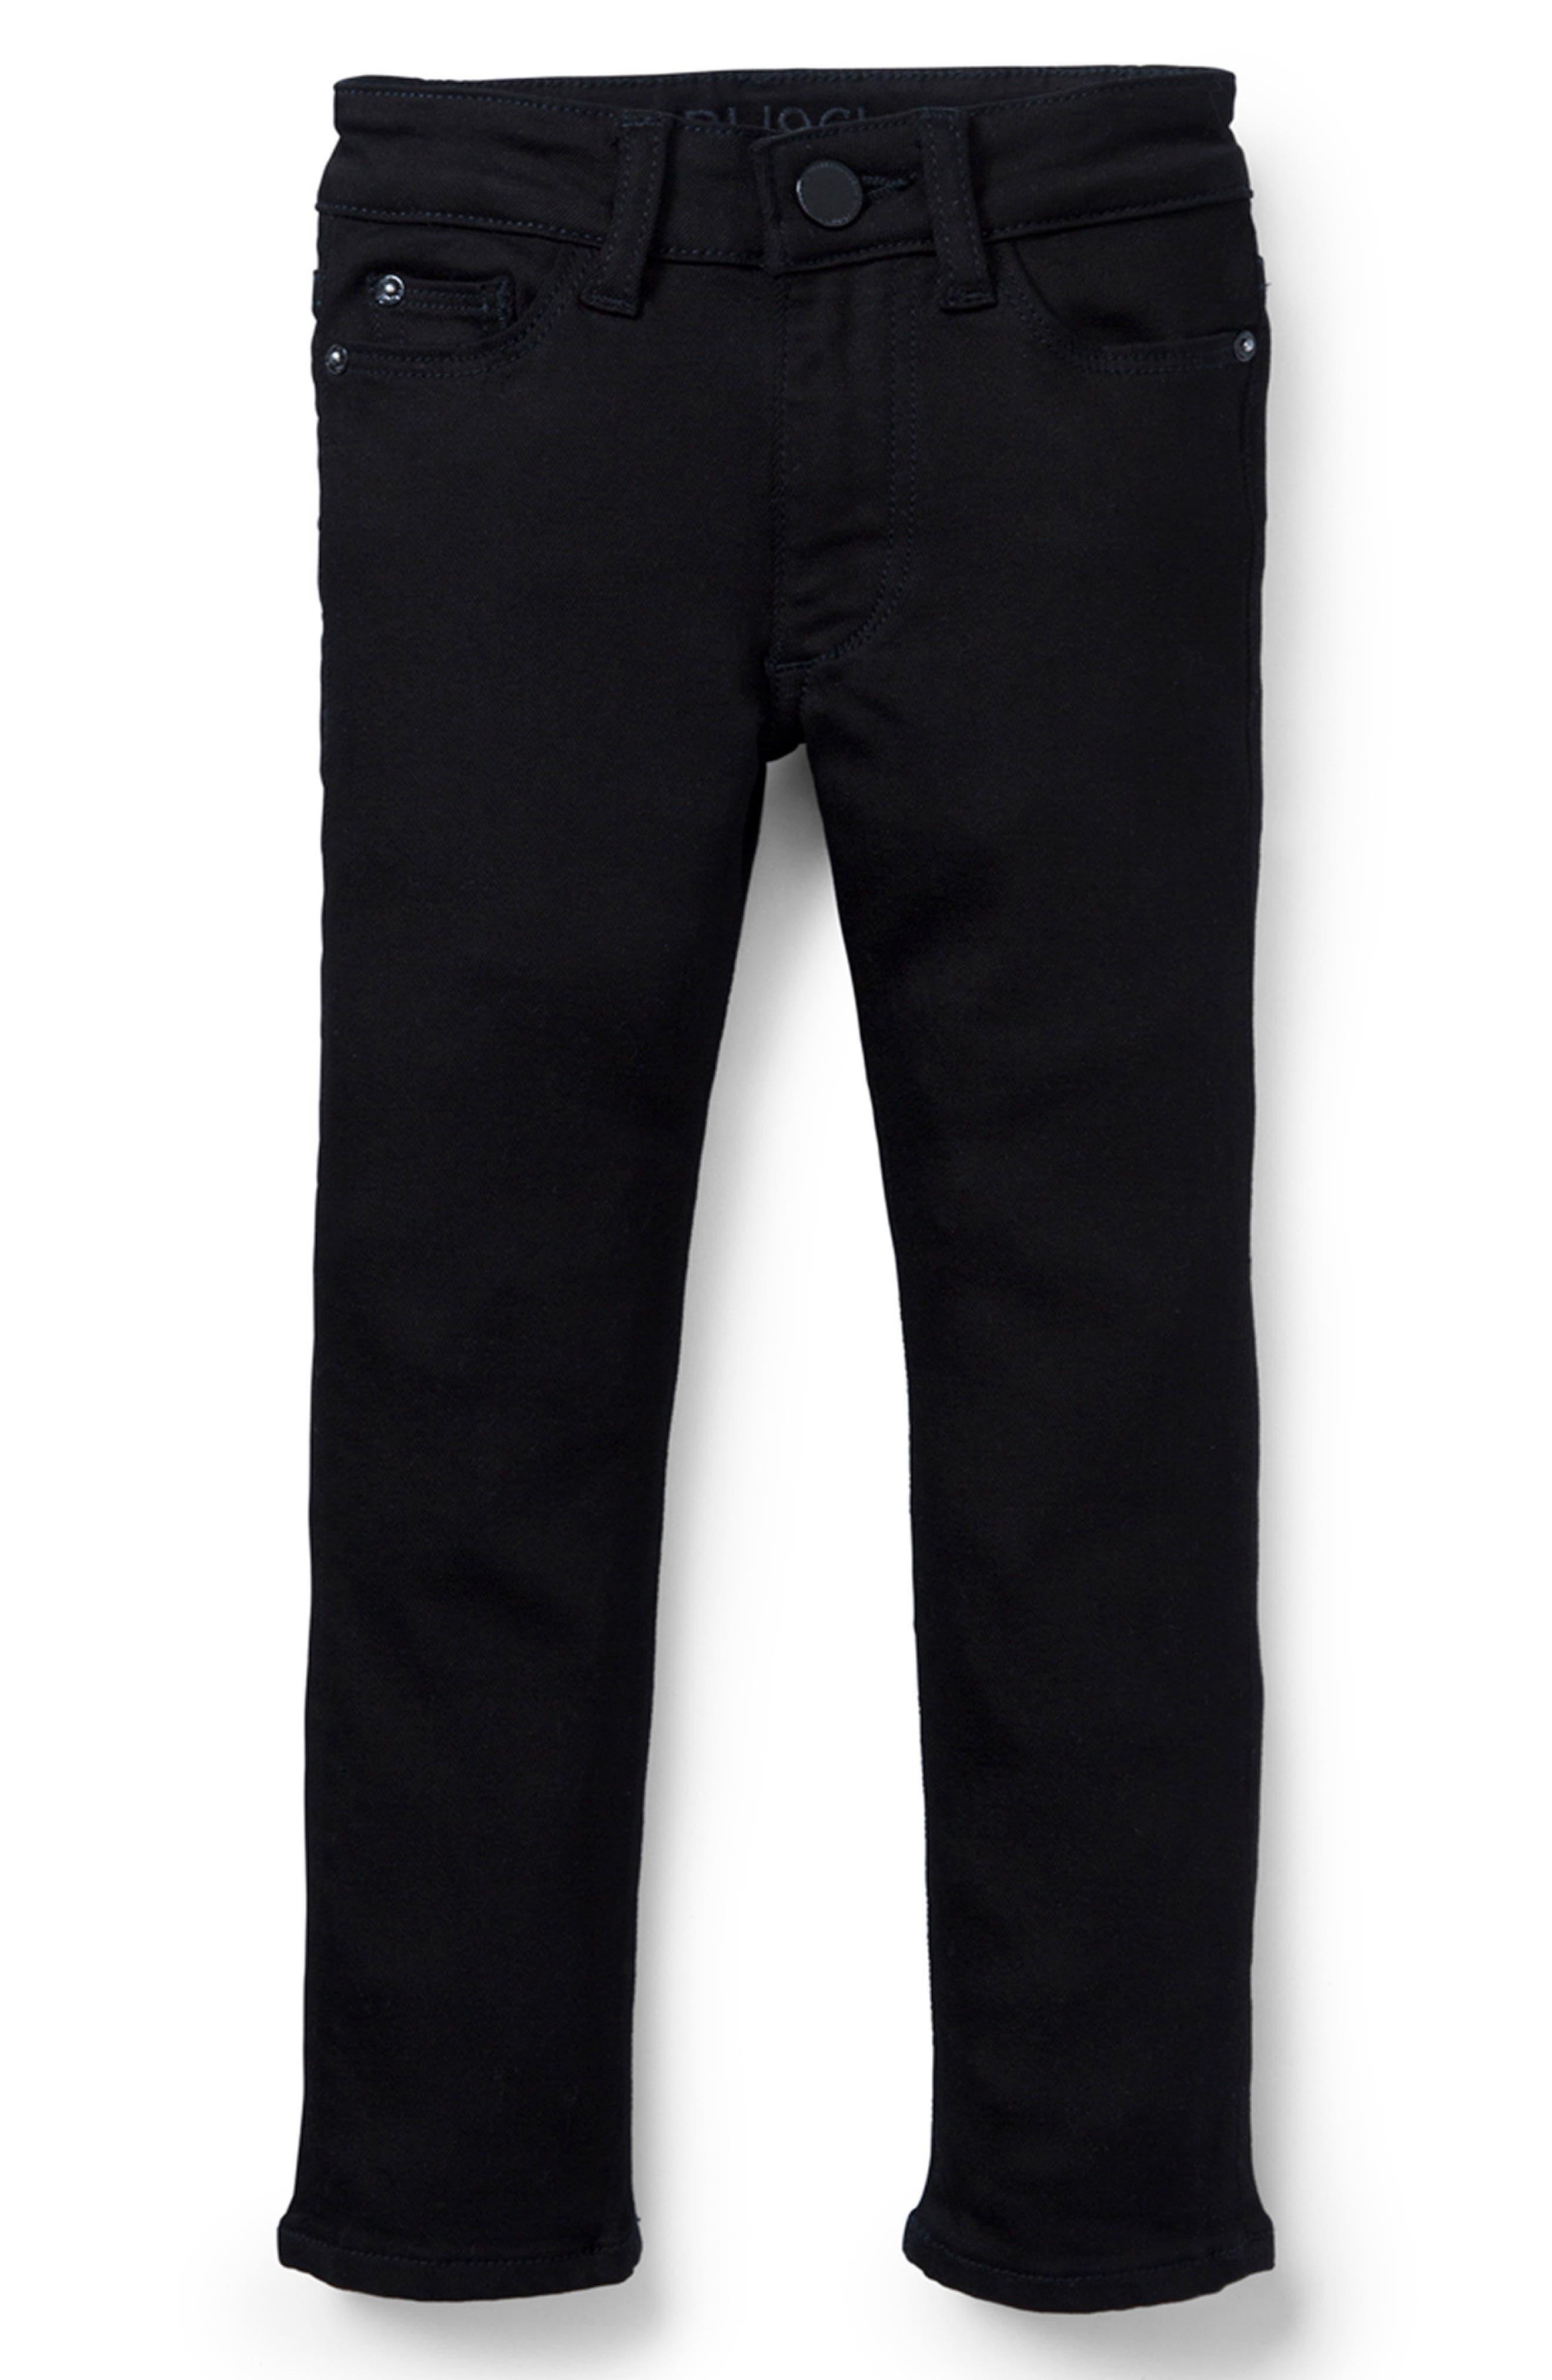 DL1961 Stretch Skinny Jeans (Toddler Girls & Little Girls)